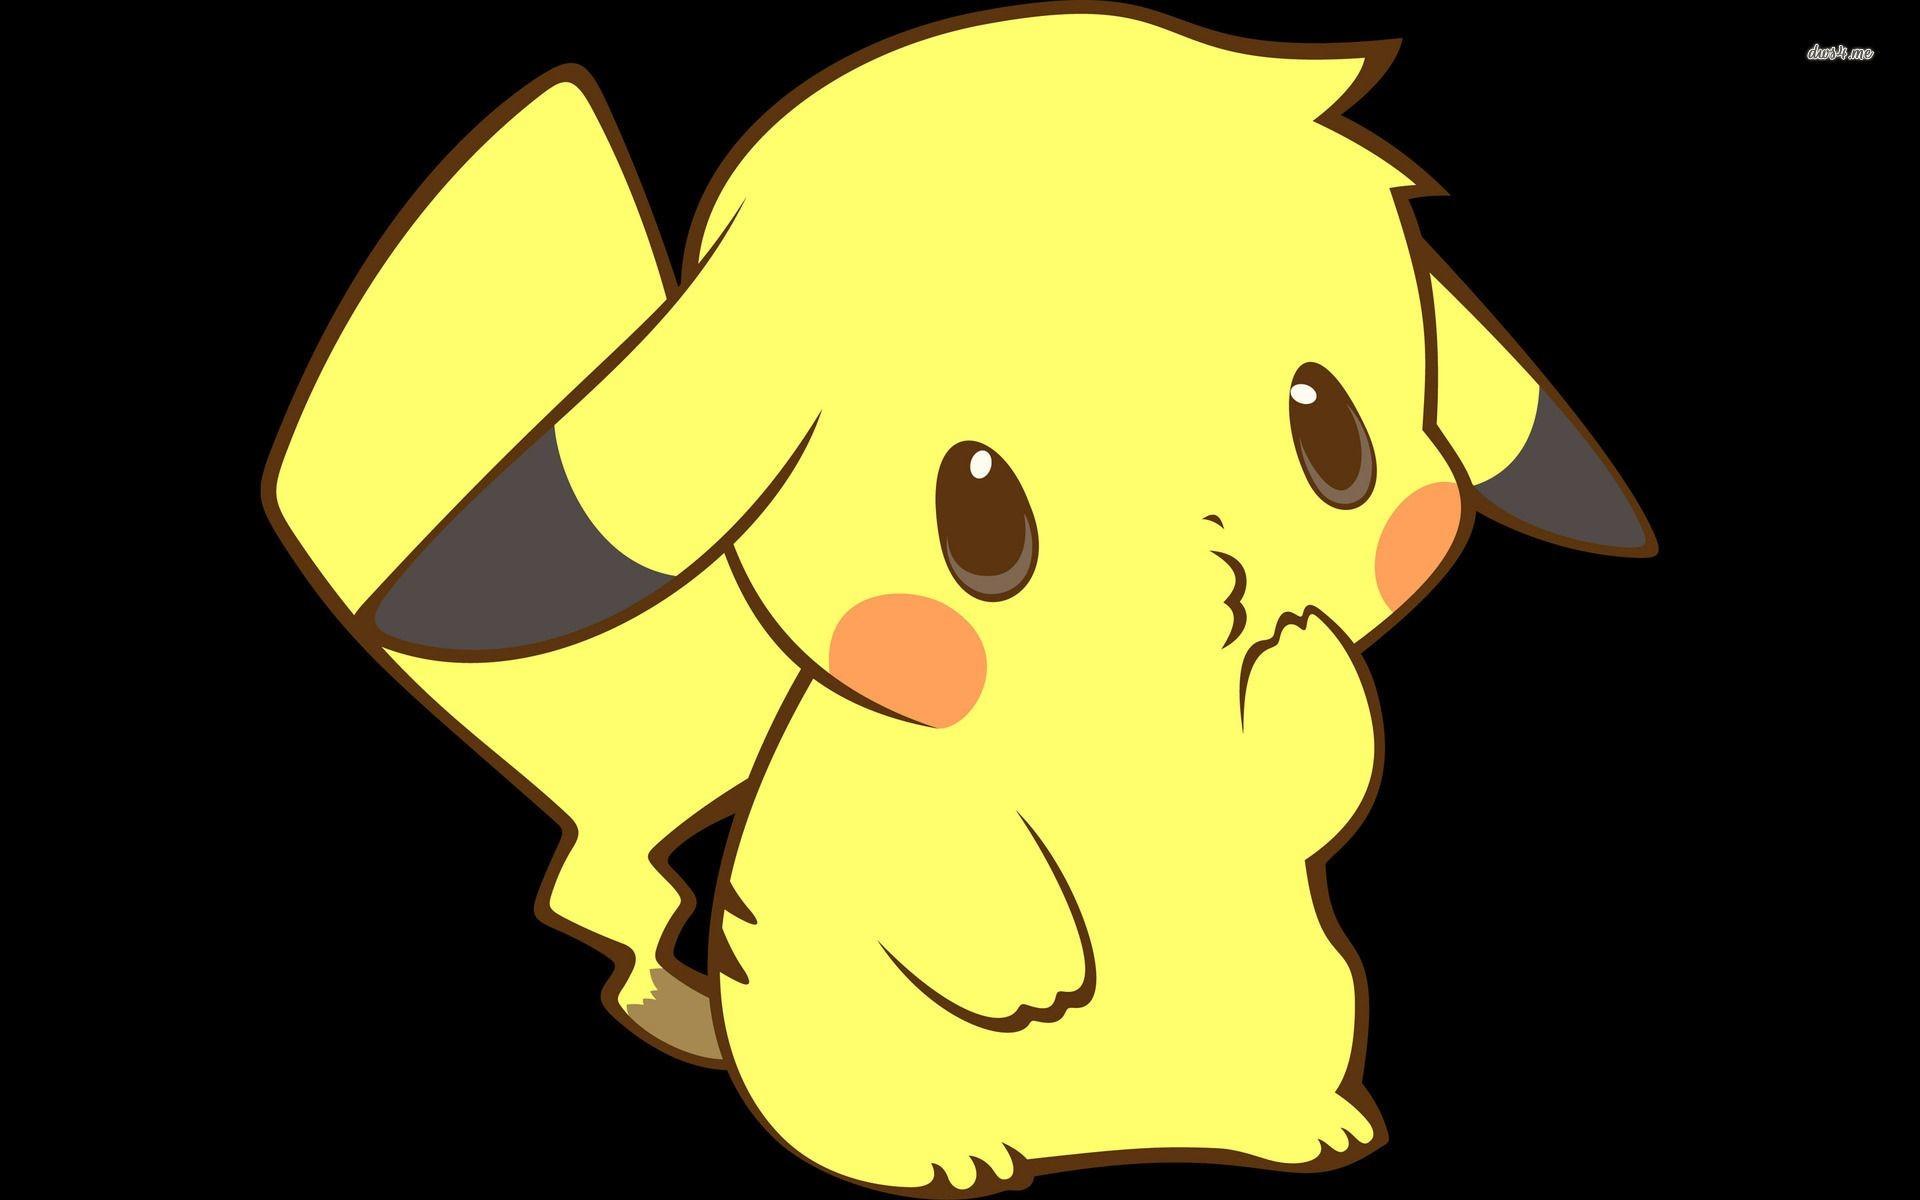 15513-pikachu-1920×1200-anime-wallpaper Pikachu Wallpapers HD free .